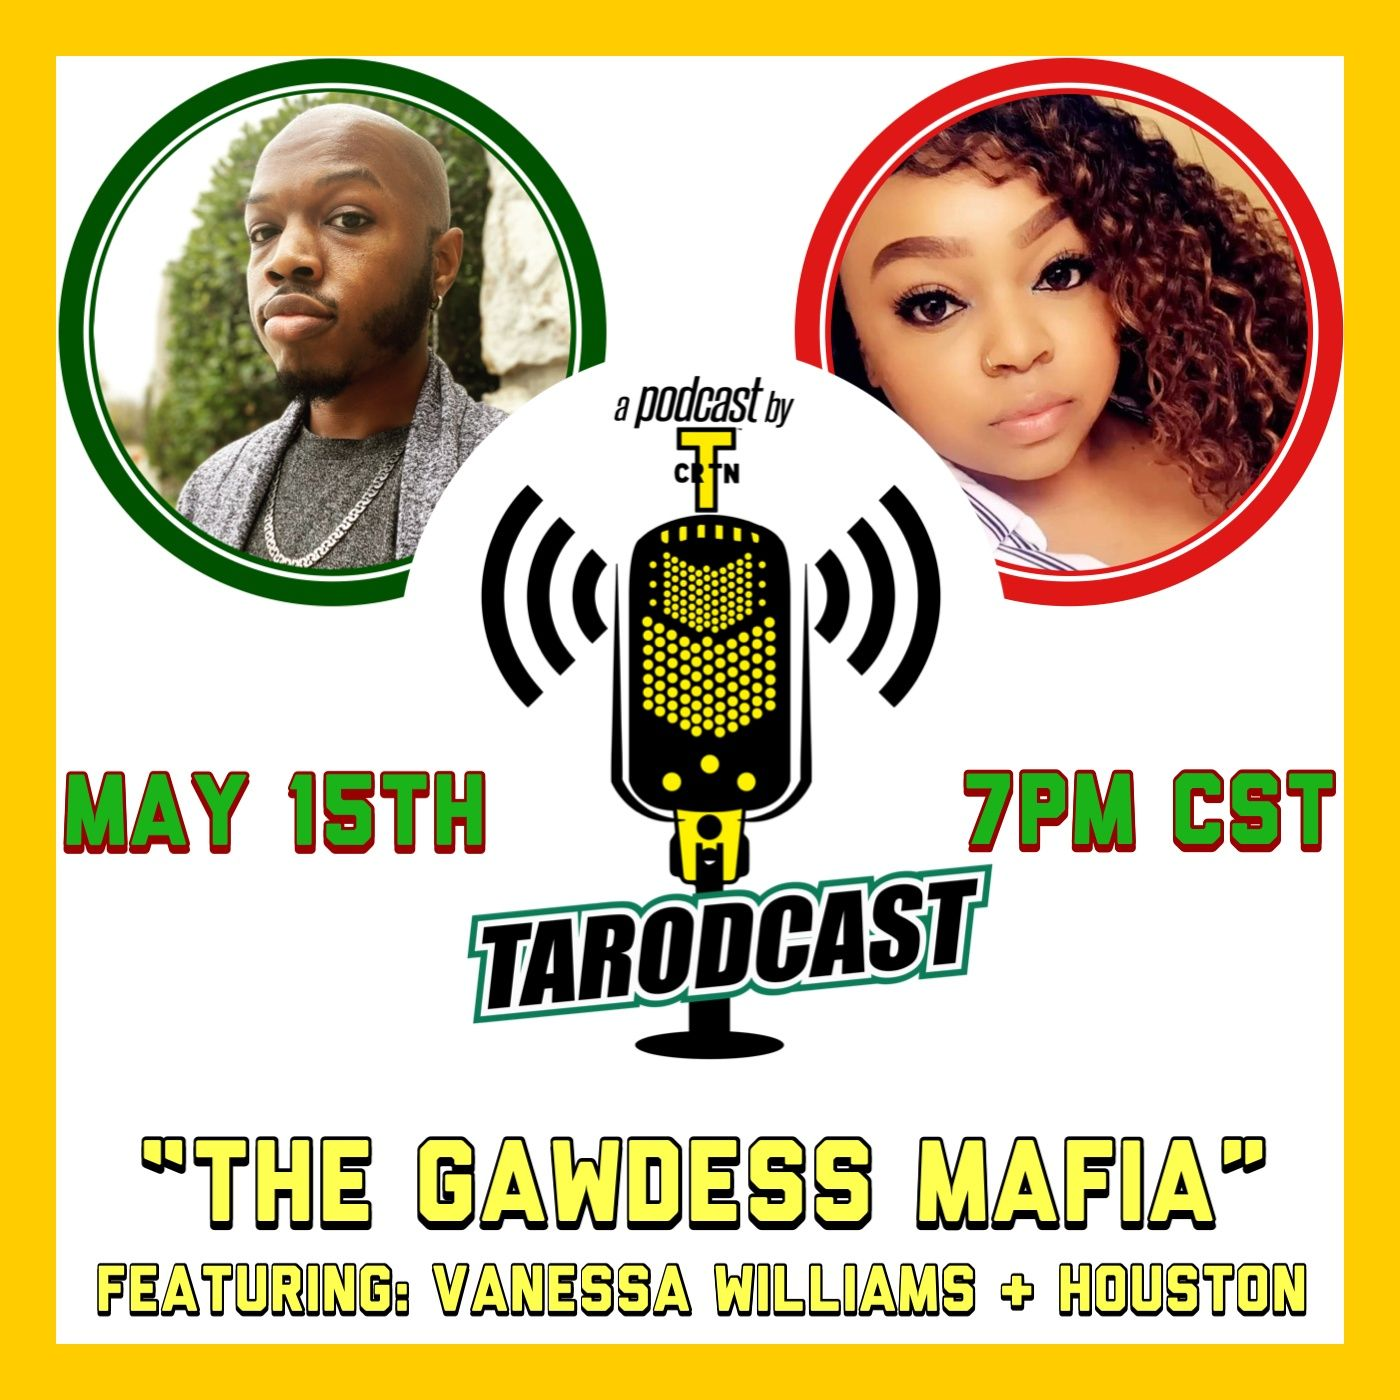 Episode #059 - The Gawdess Mafia (Featuring: Vanessa Williams & Houston)